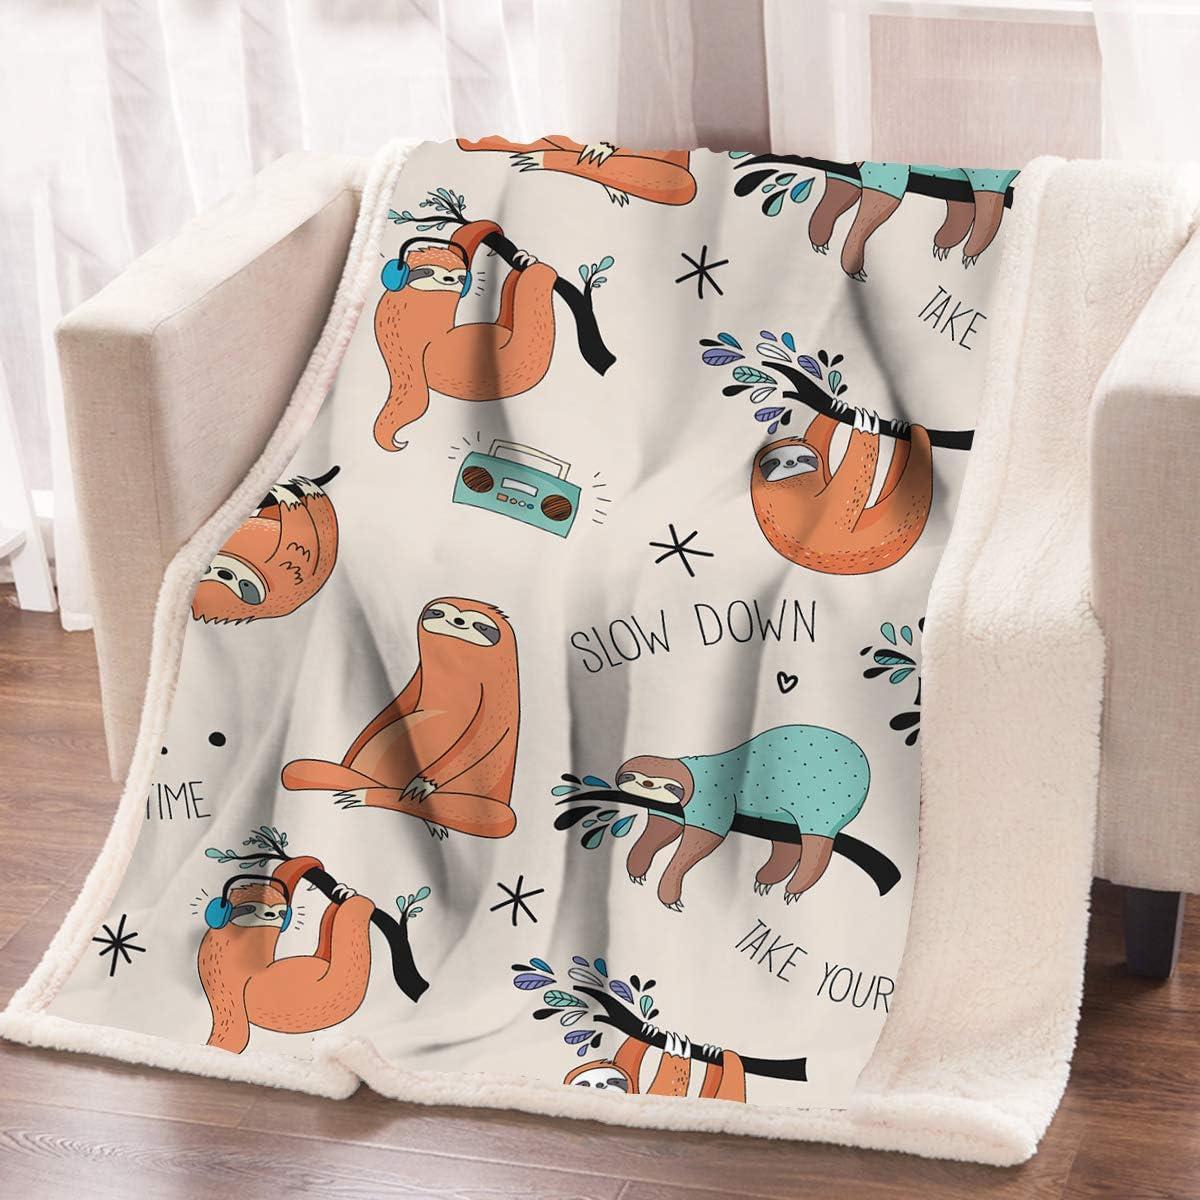 ARIGHTEX Sloth Charlotte Mall Blanket Soft Atlanta Mall Fleece Throw Orange H Sloths